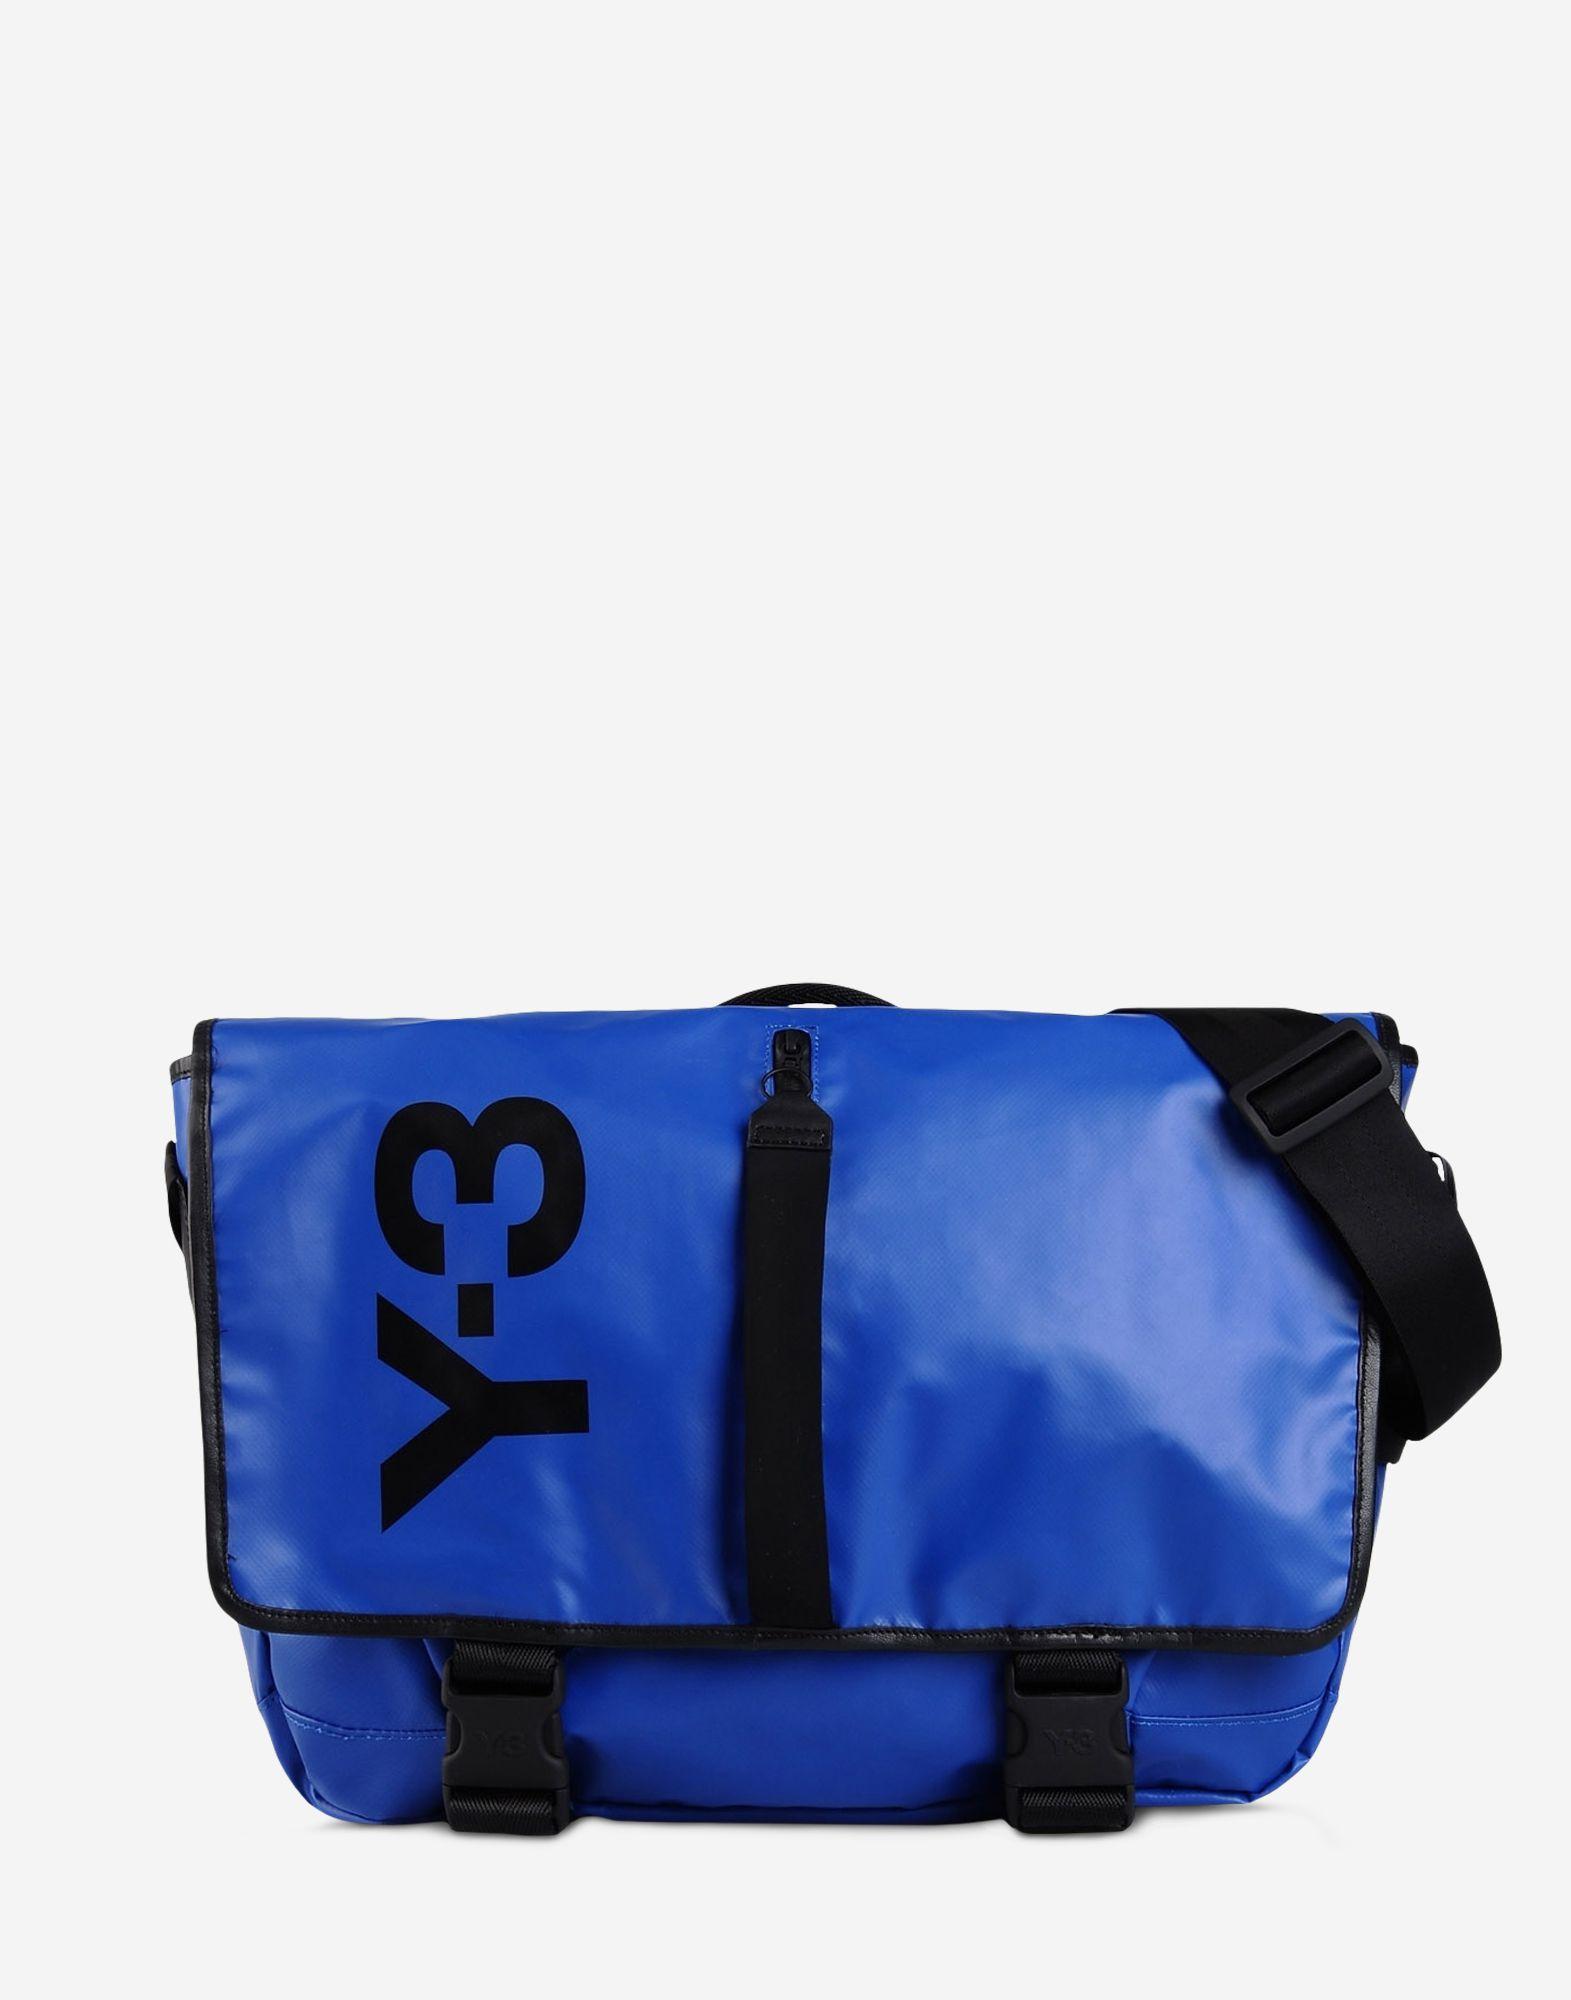 ... Y-3 Y-3 Day Messenger Bag Large fabric bag E ... 41a38e2147338